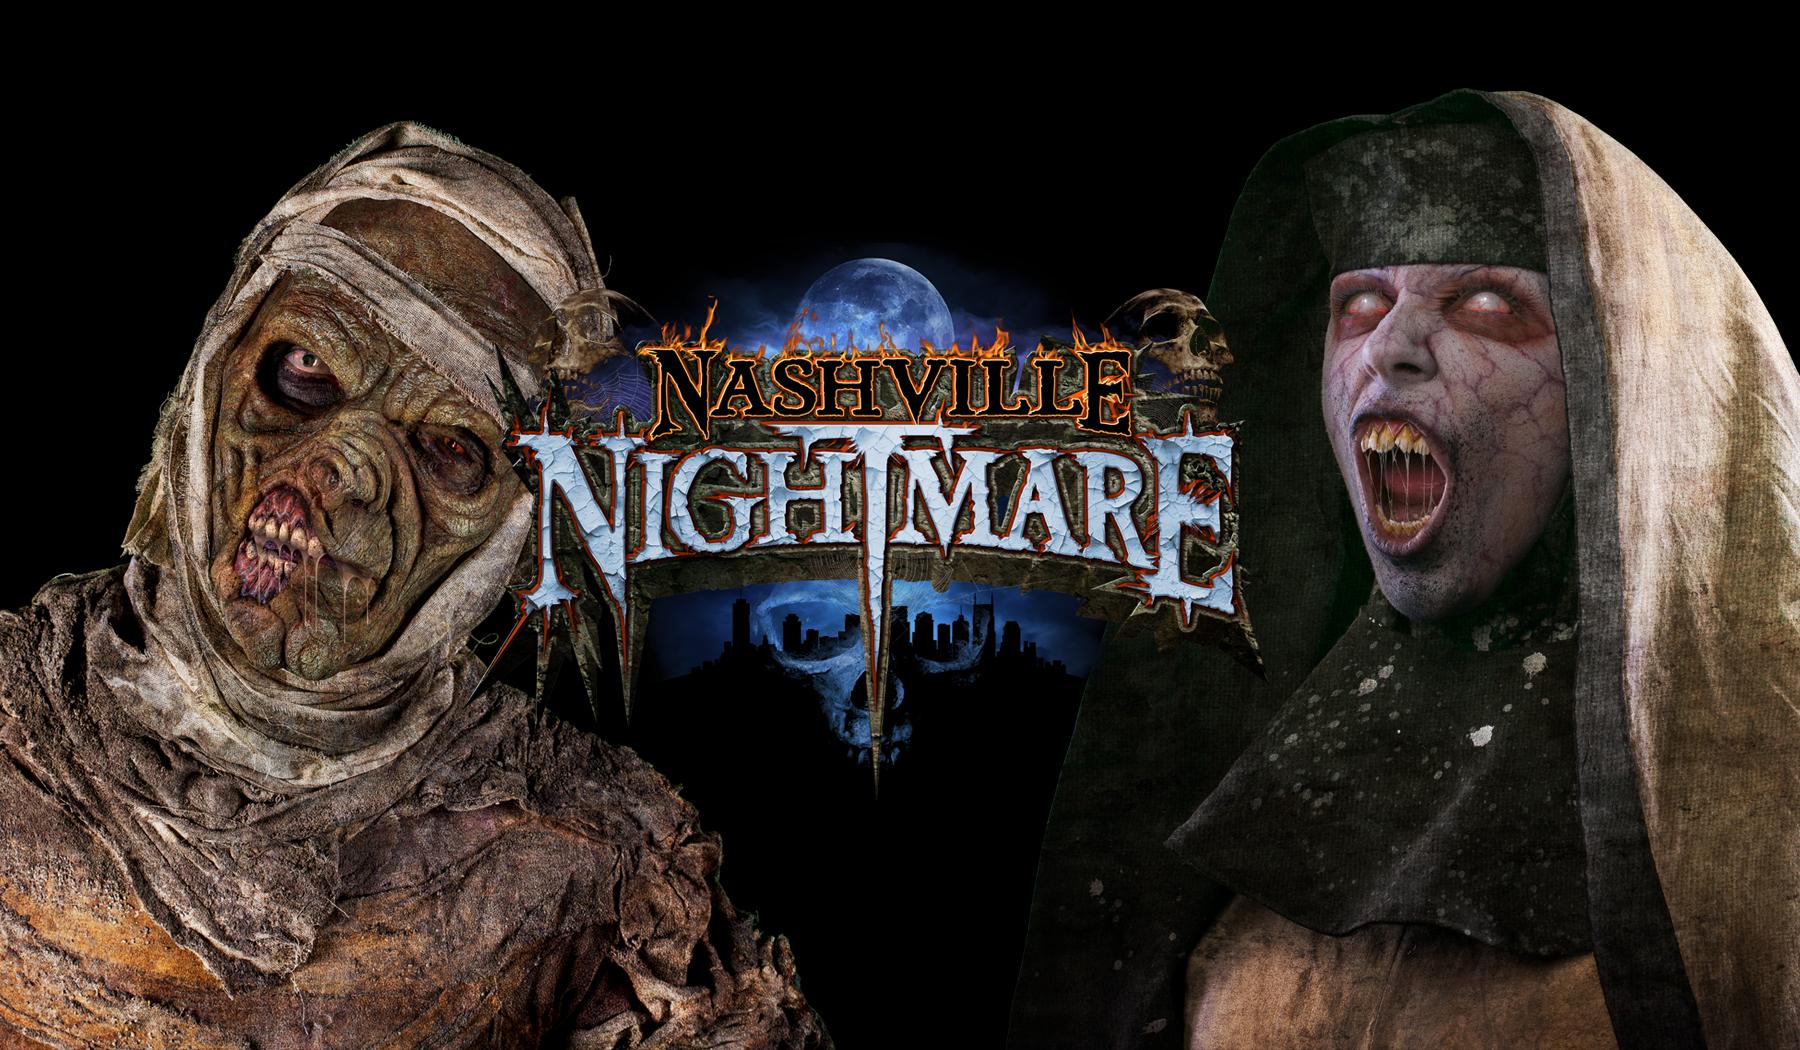 Halloween Carnivals Nashville 2020 Halloween haunted house accident: Man stabbed at Nashville Nightmare